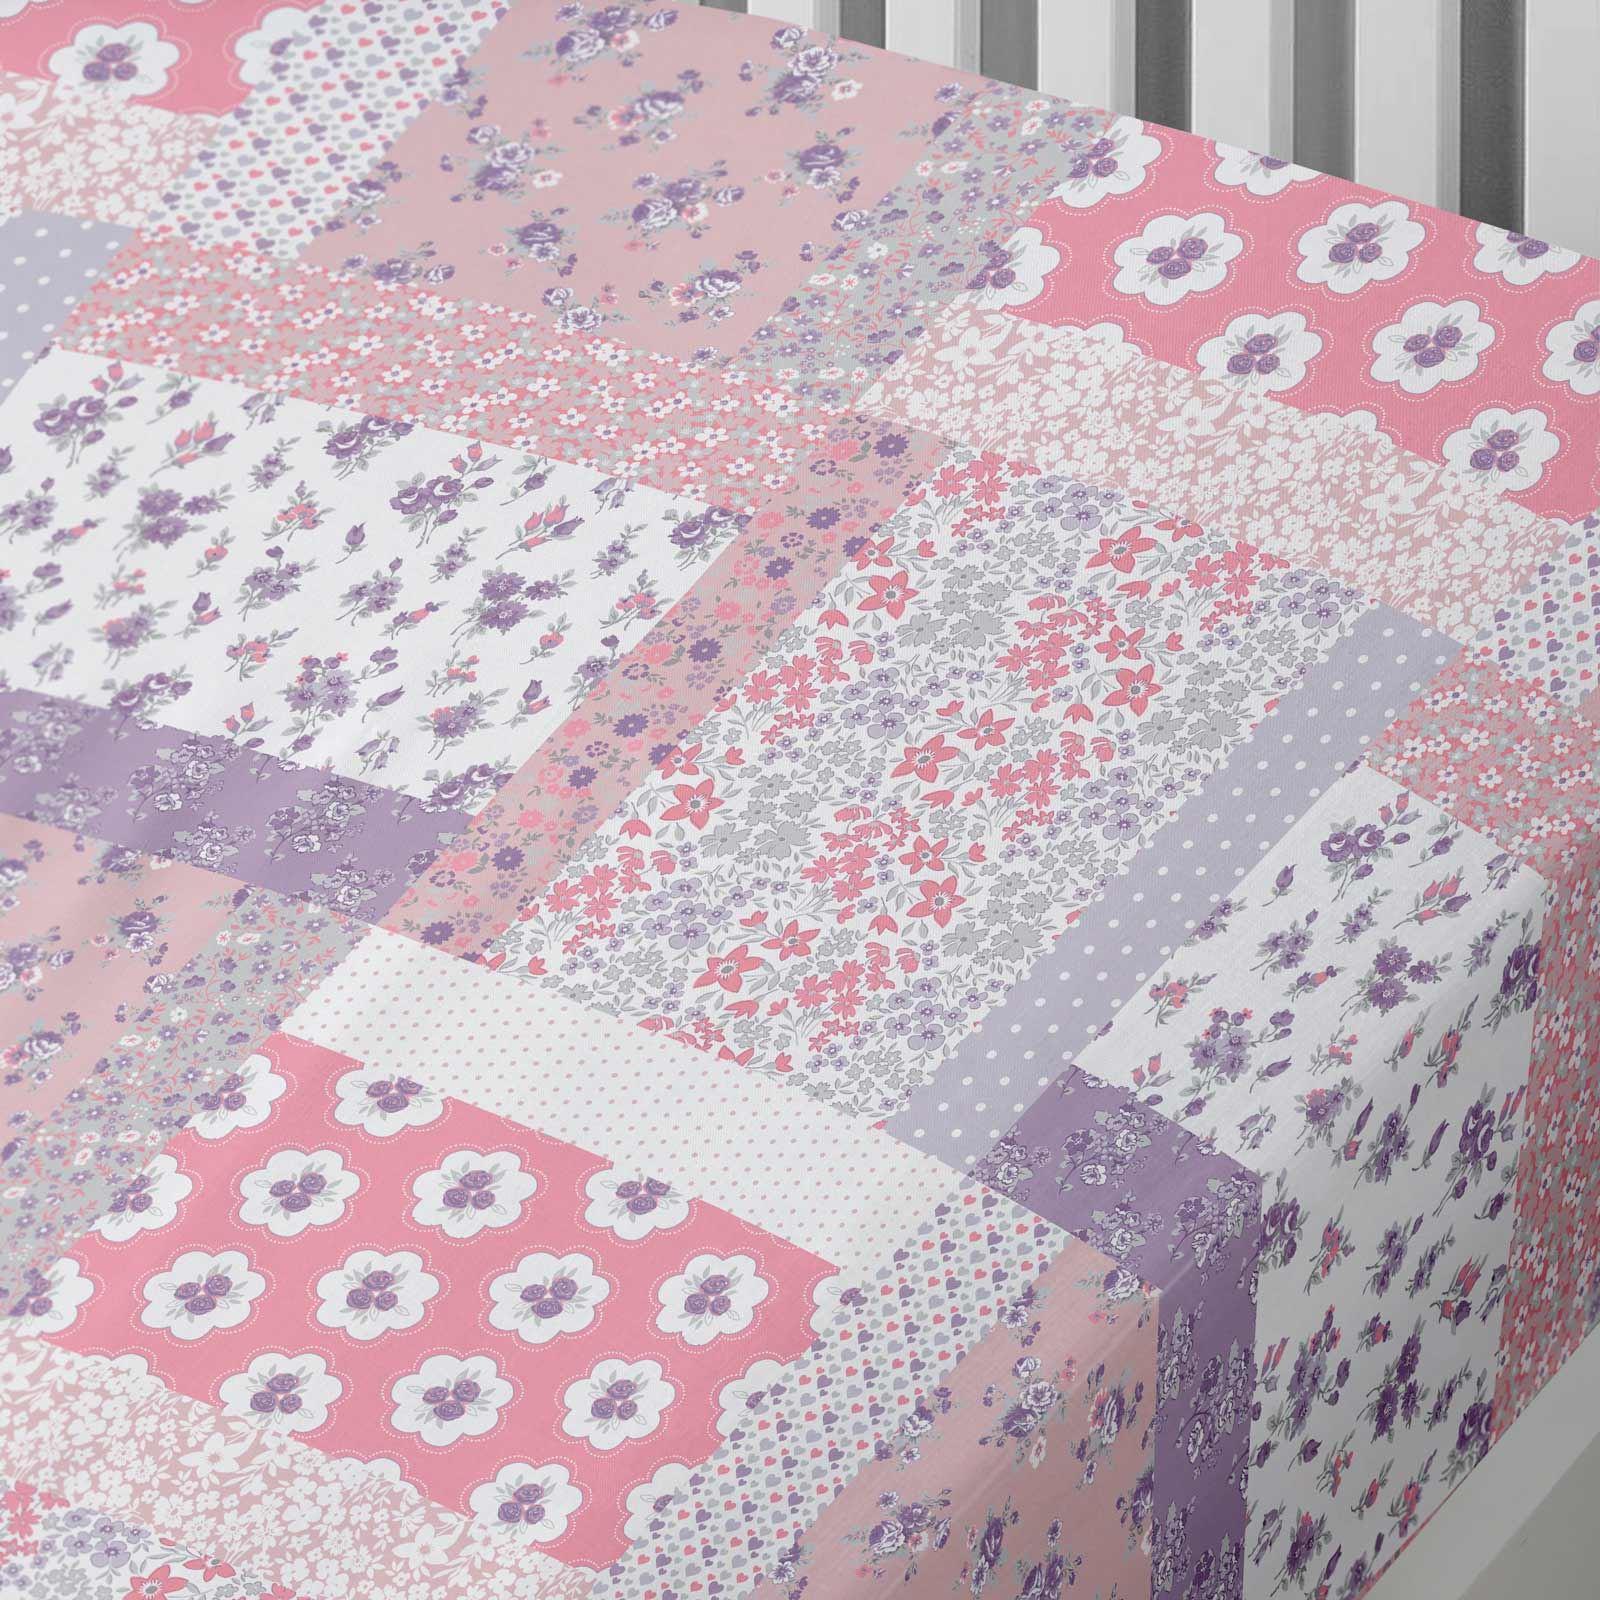 Kids-Duvet-Covers-Pink-Mermaids-Floral-Reversible-Print-Quilt-Bedding-Sets thumbnail 13